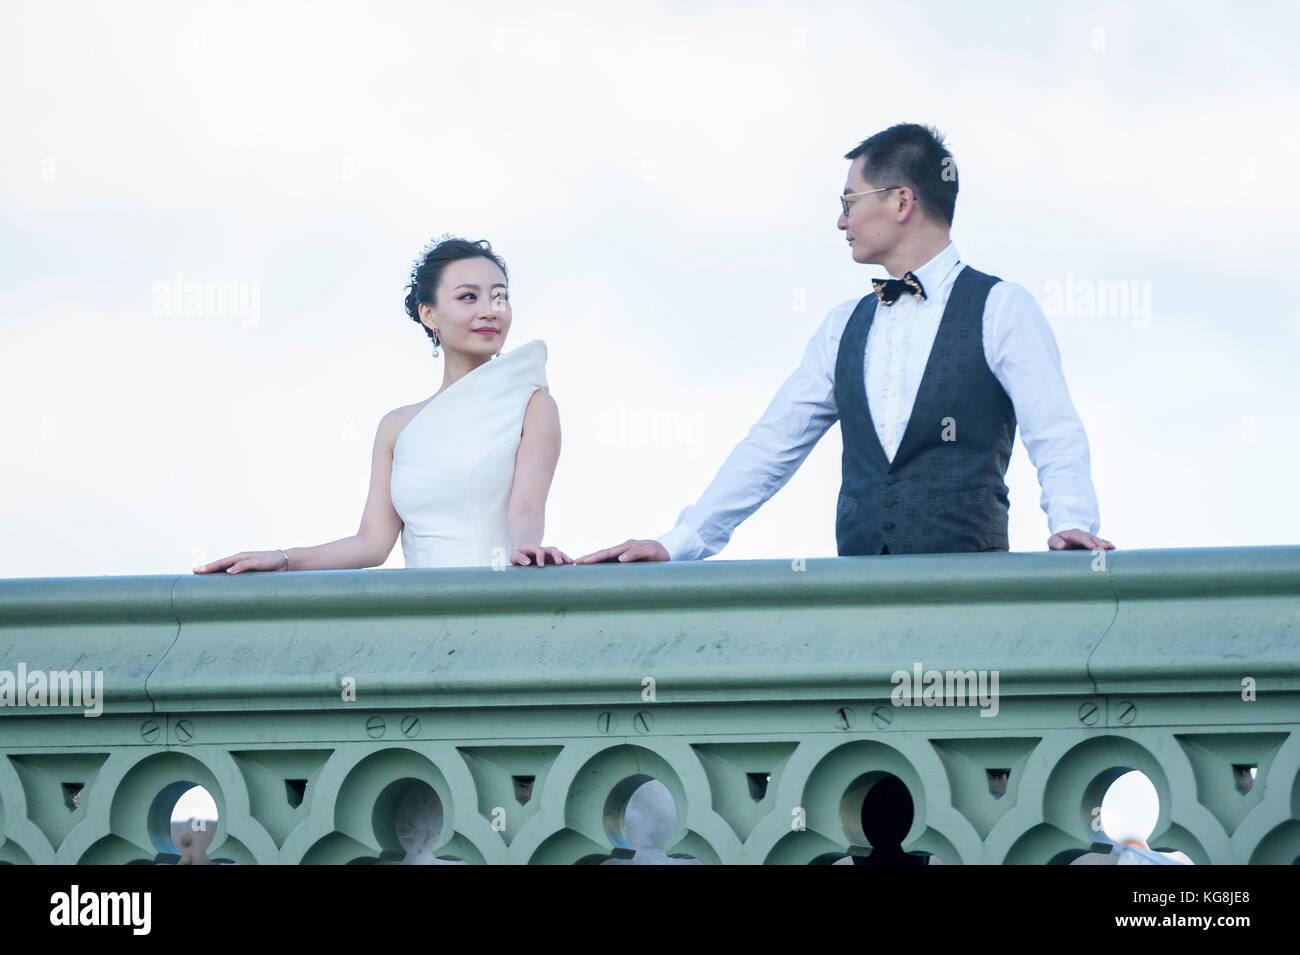 Chinese Couple Wedding Photographs Taken Stock Photos & Chinese ...